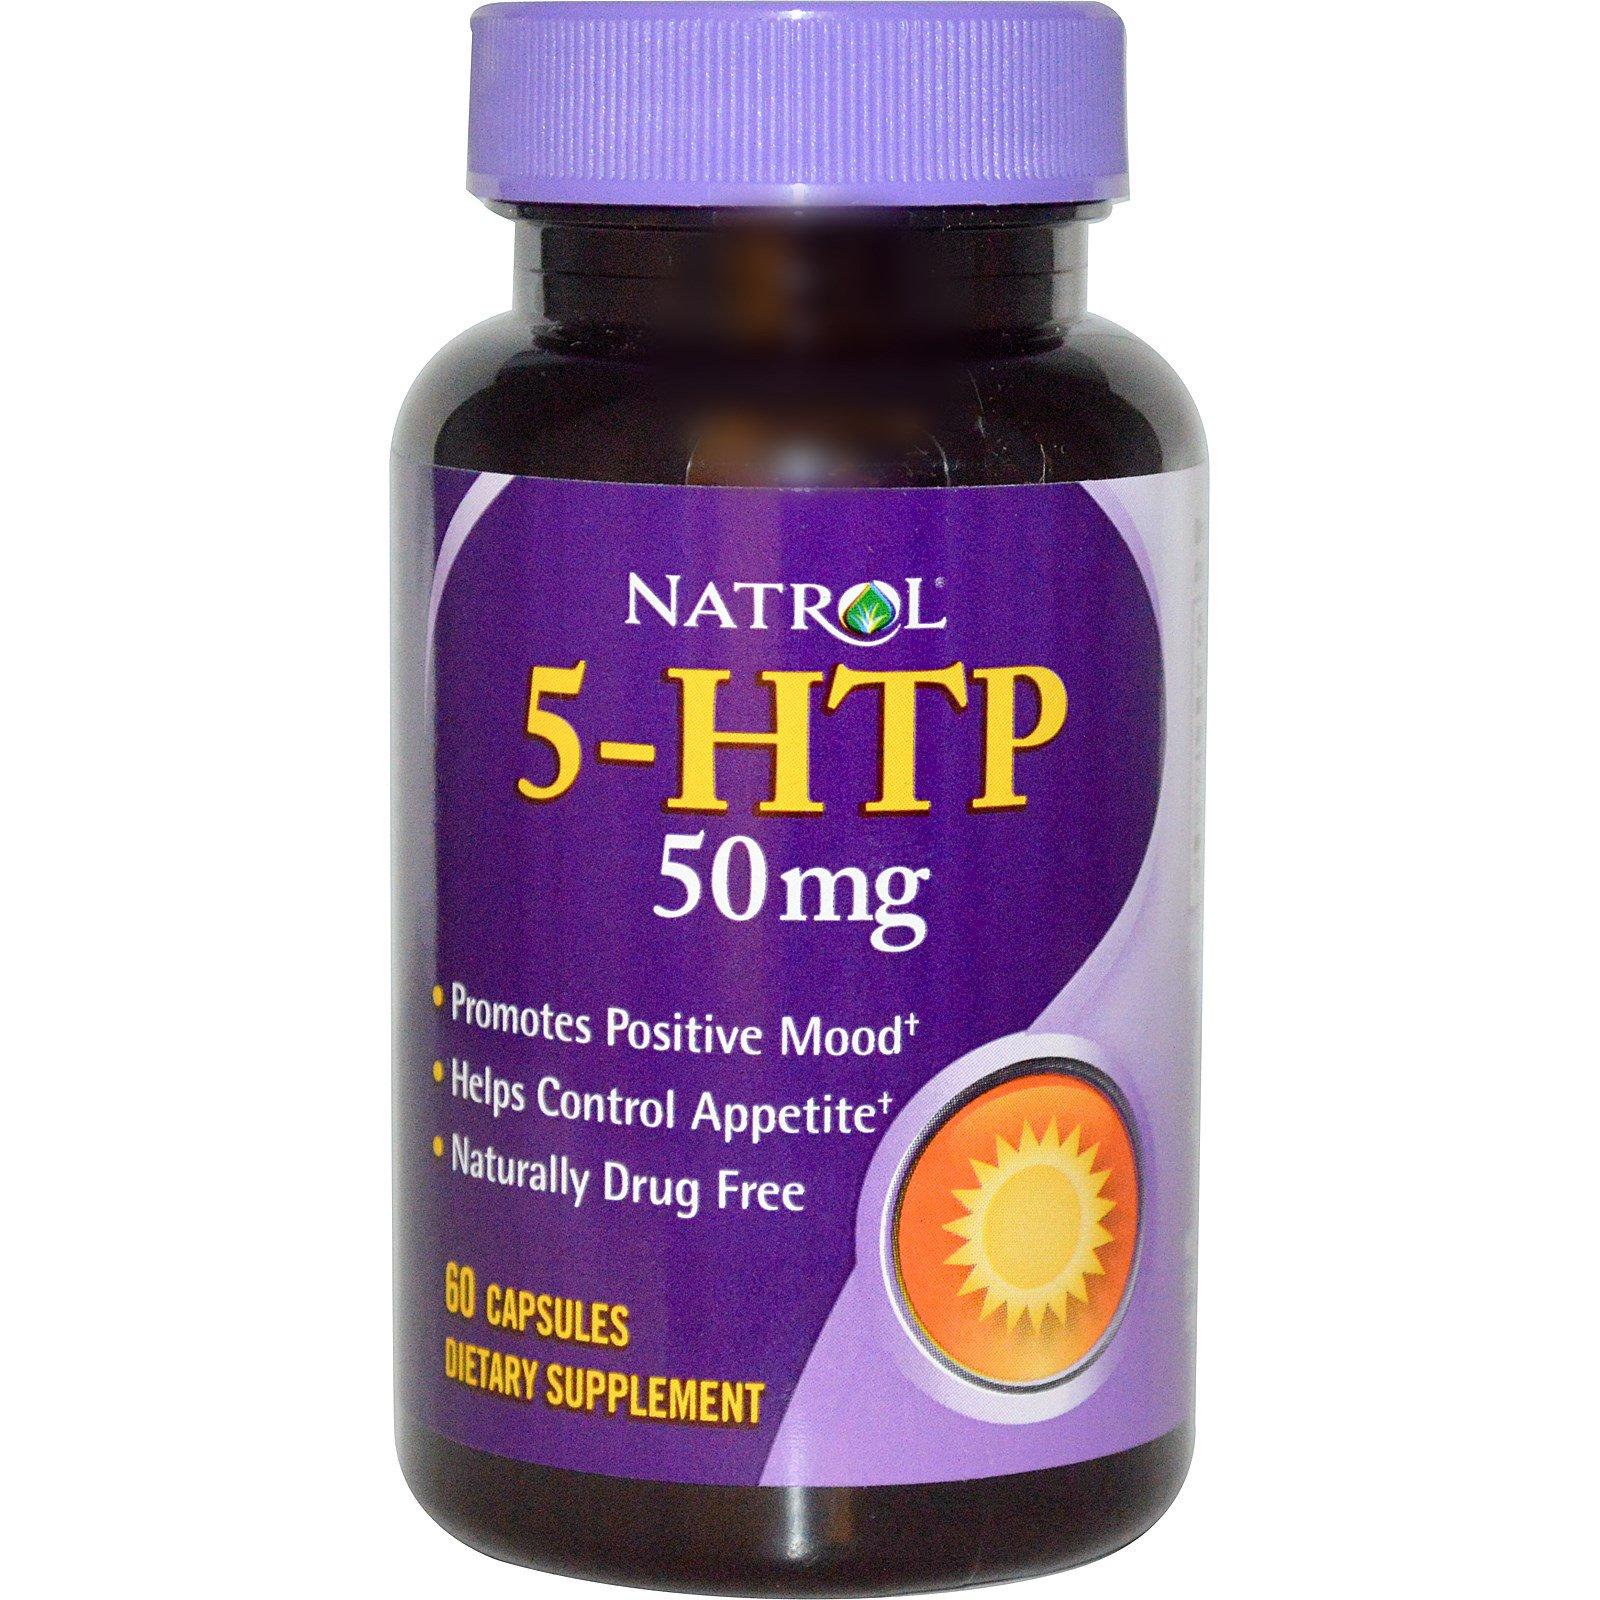 Natrol, 5-HTP, 50 mg, 60 Capsules (Discontinued Item)